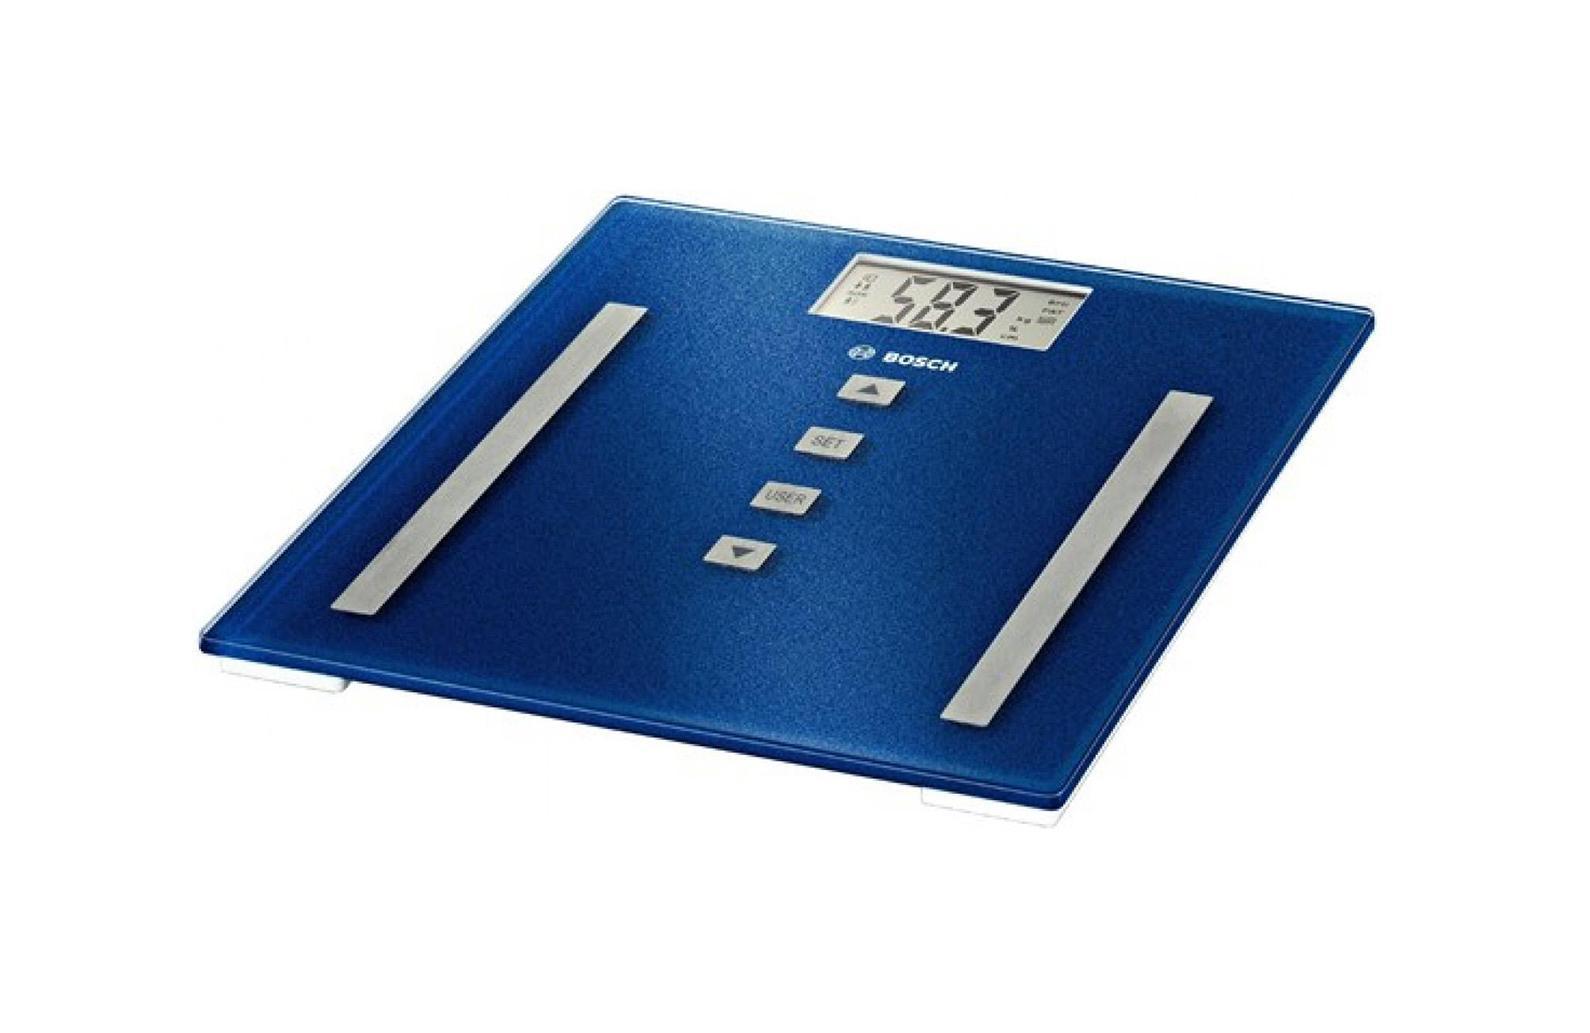 Bosch PPW 3320 напольные весы, Bosch GmbH